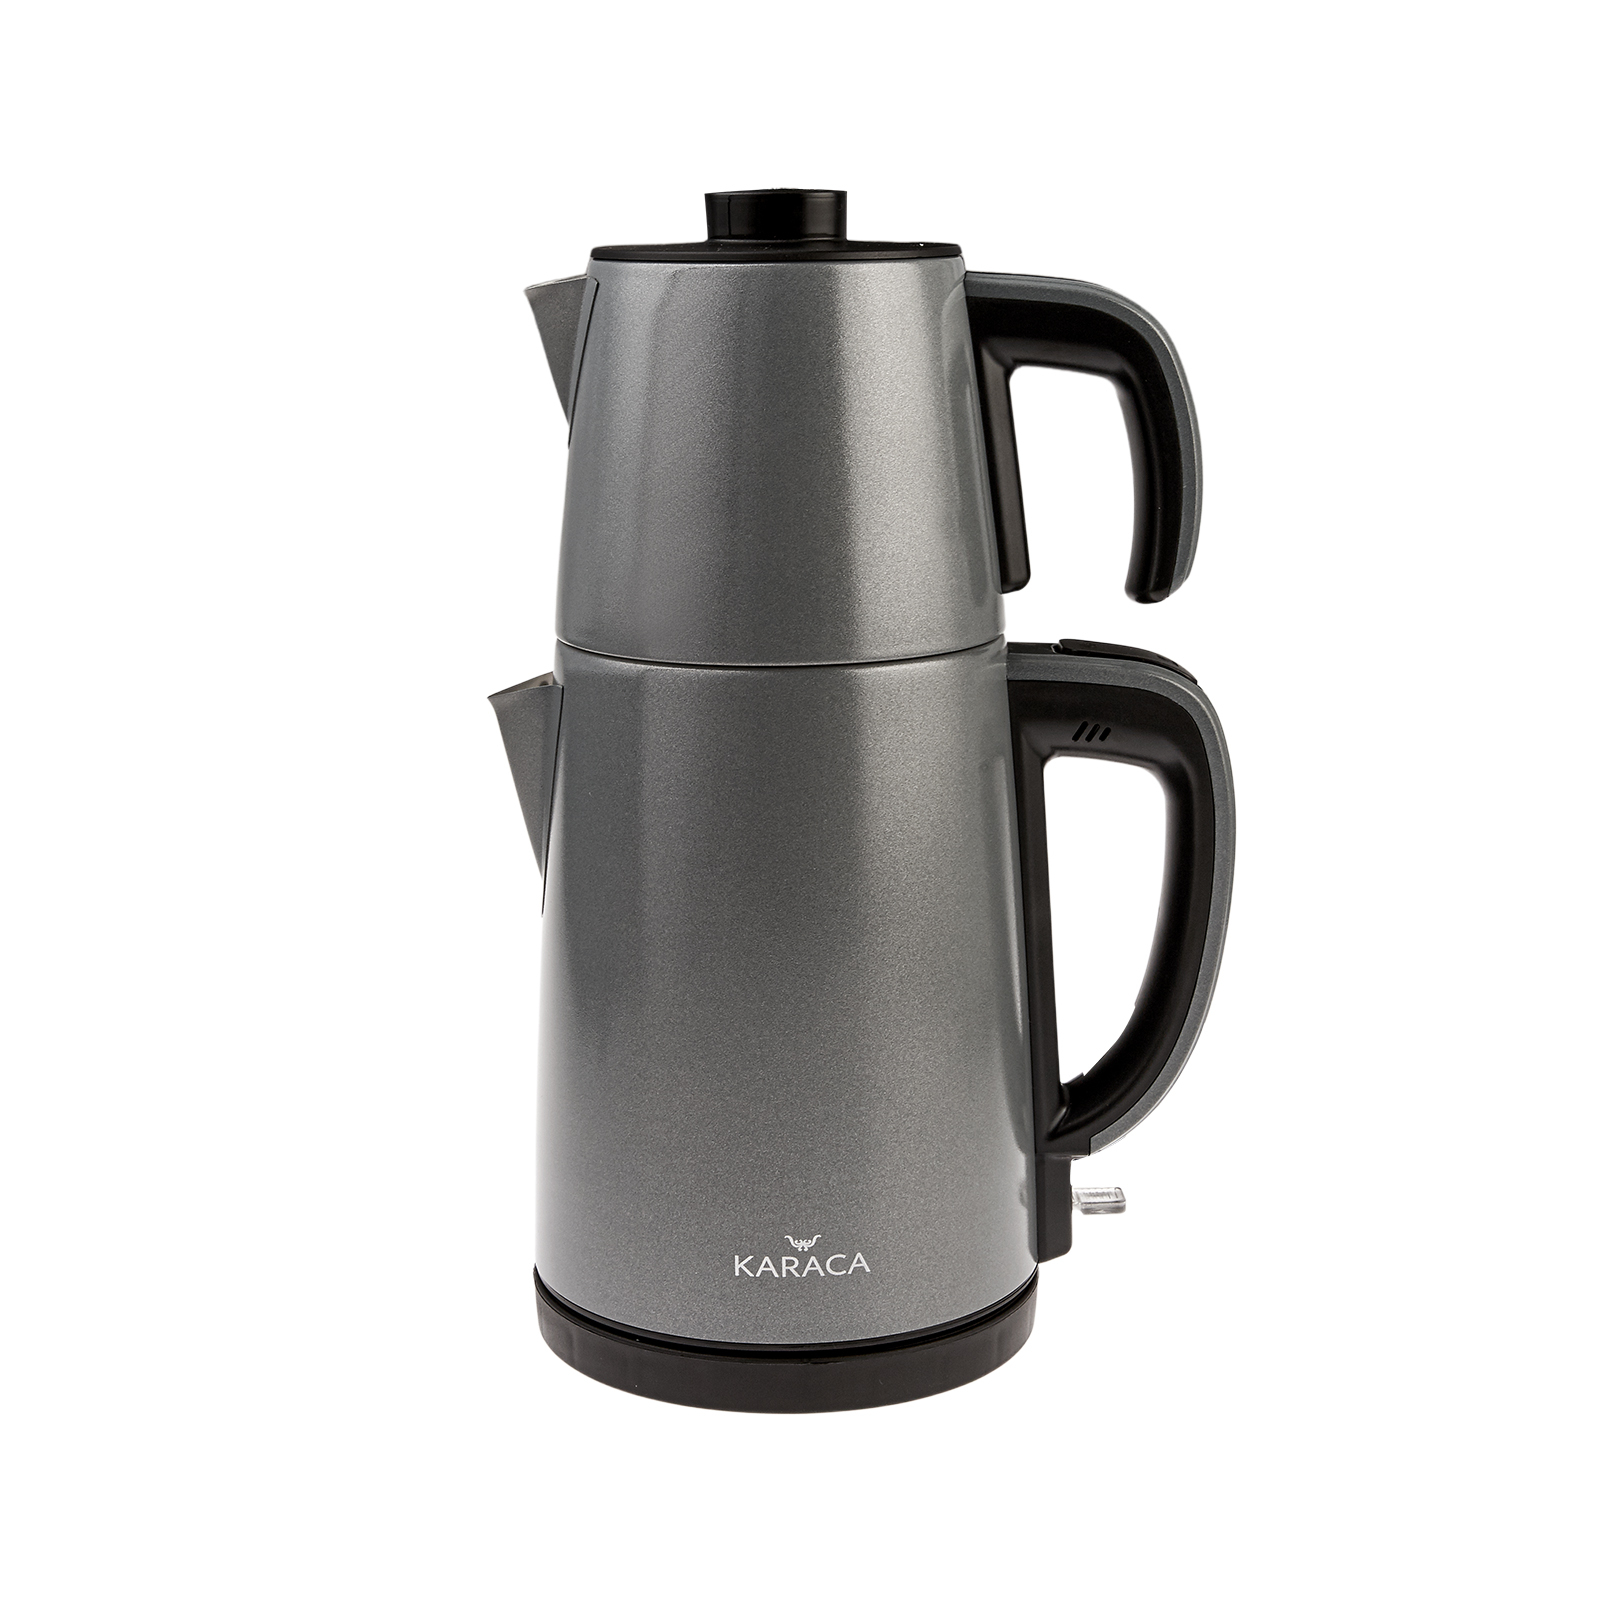 Karaca Dem Keyfi Antrasit Çay Makinesi